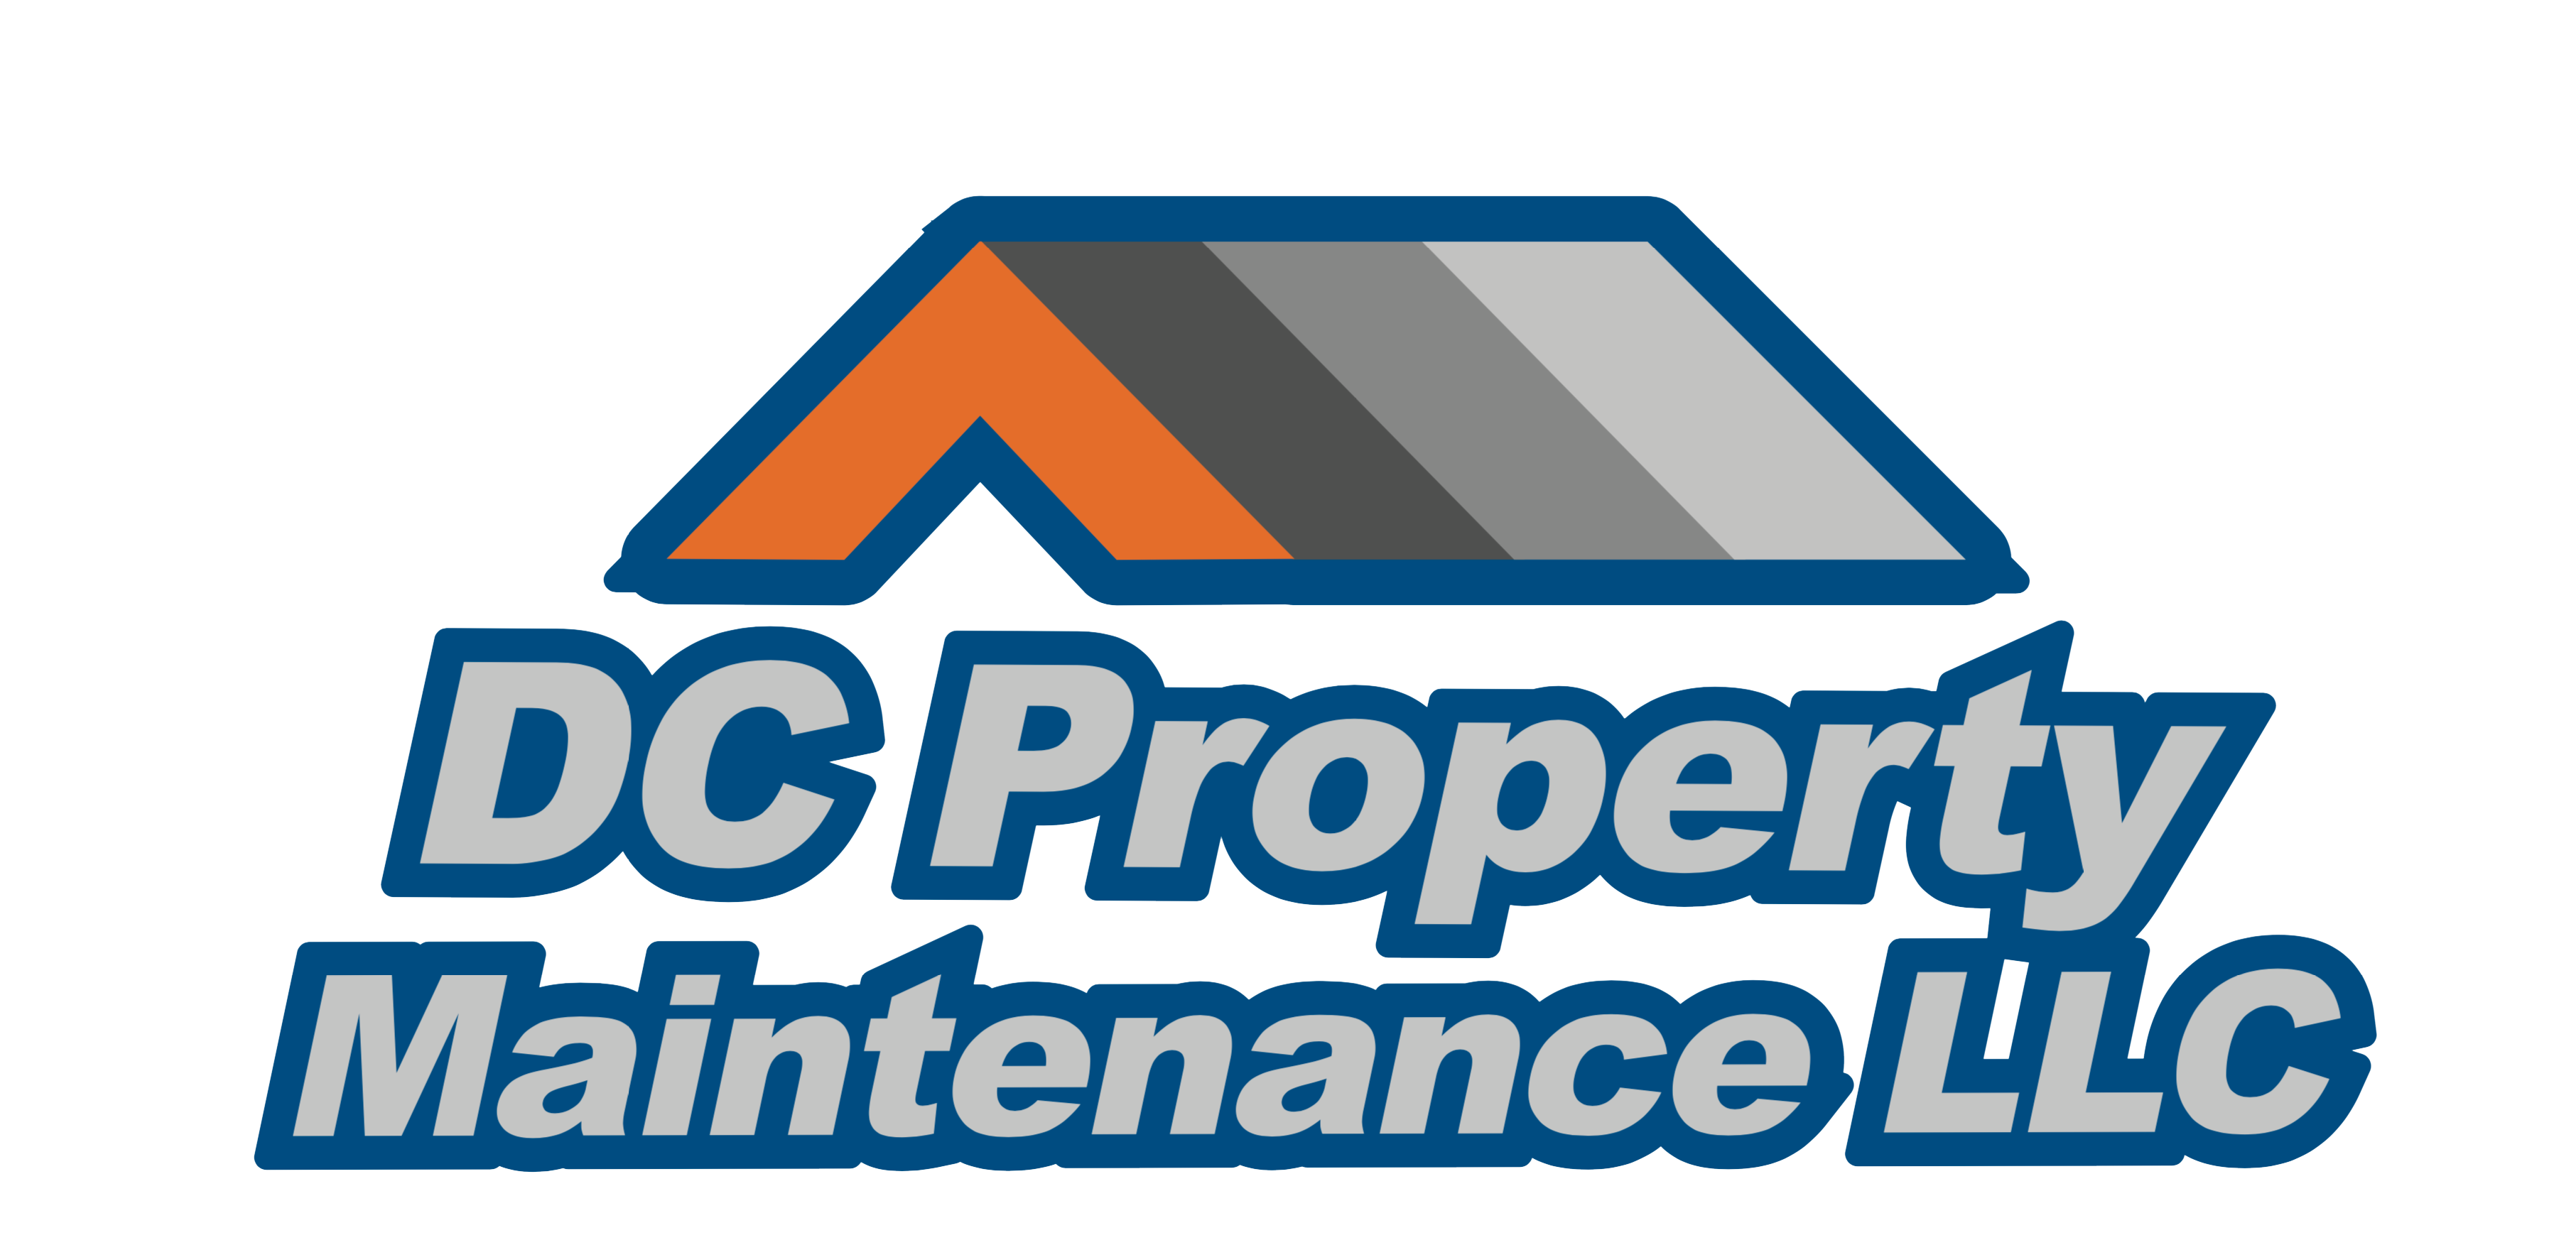 dc property maintenance llc